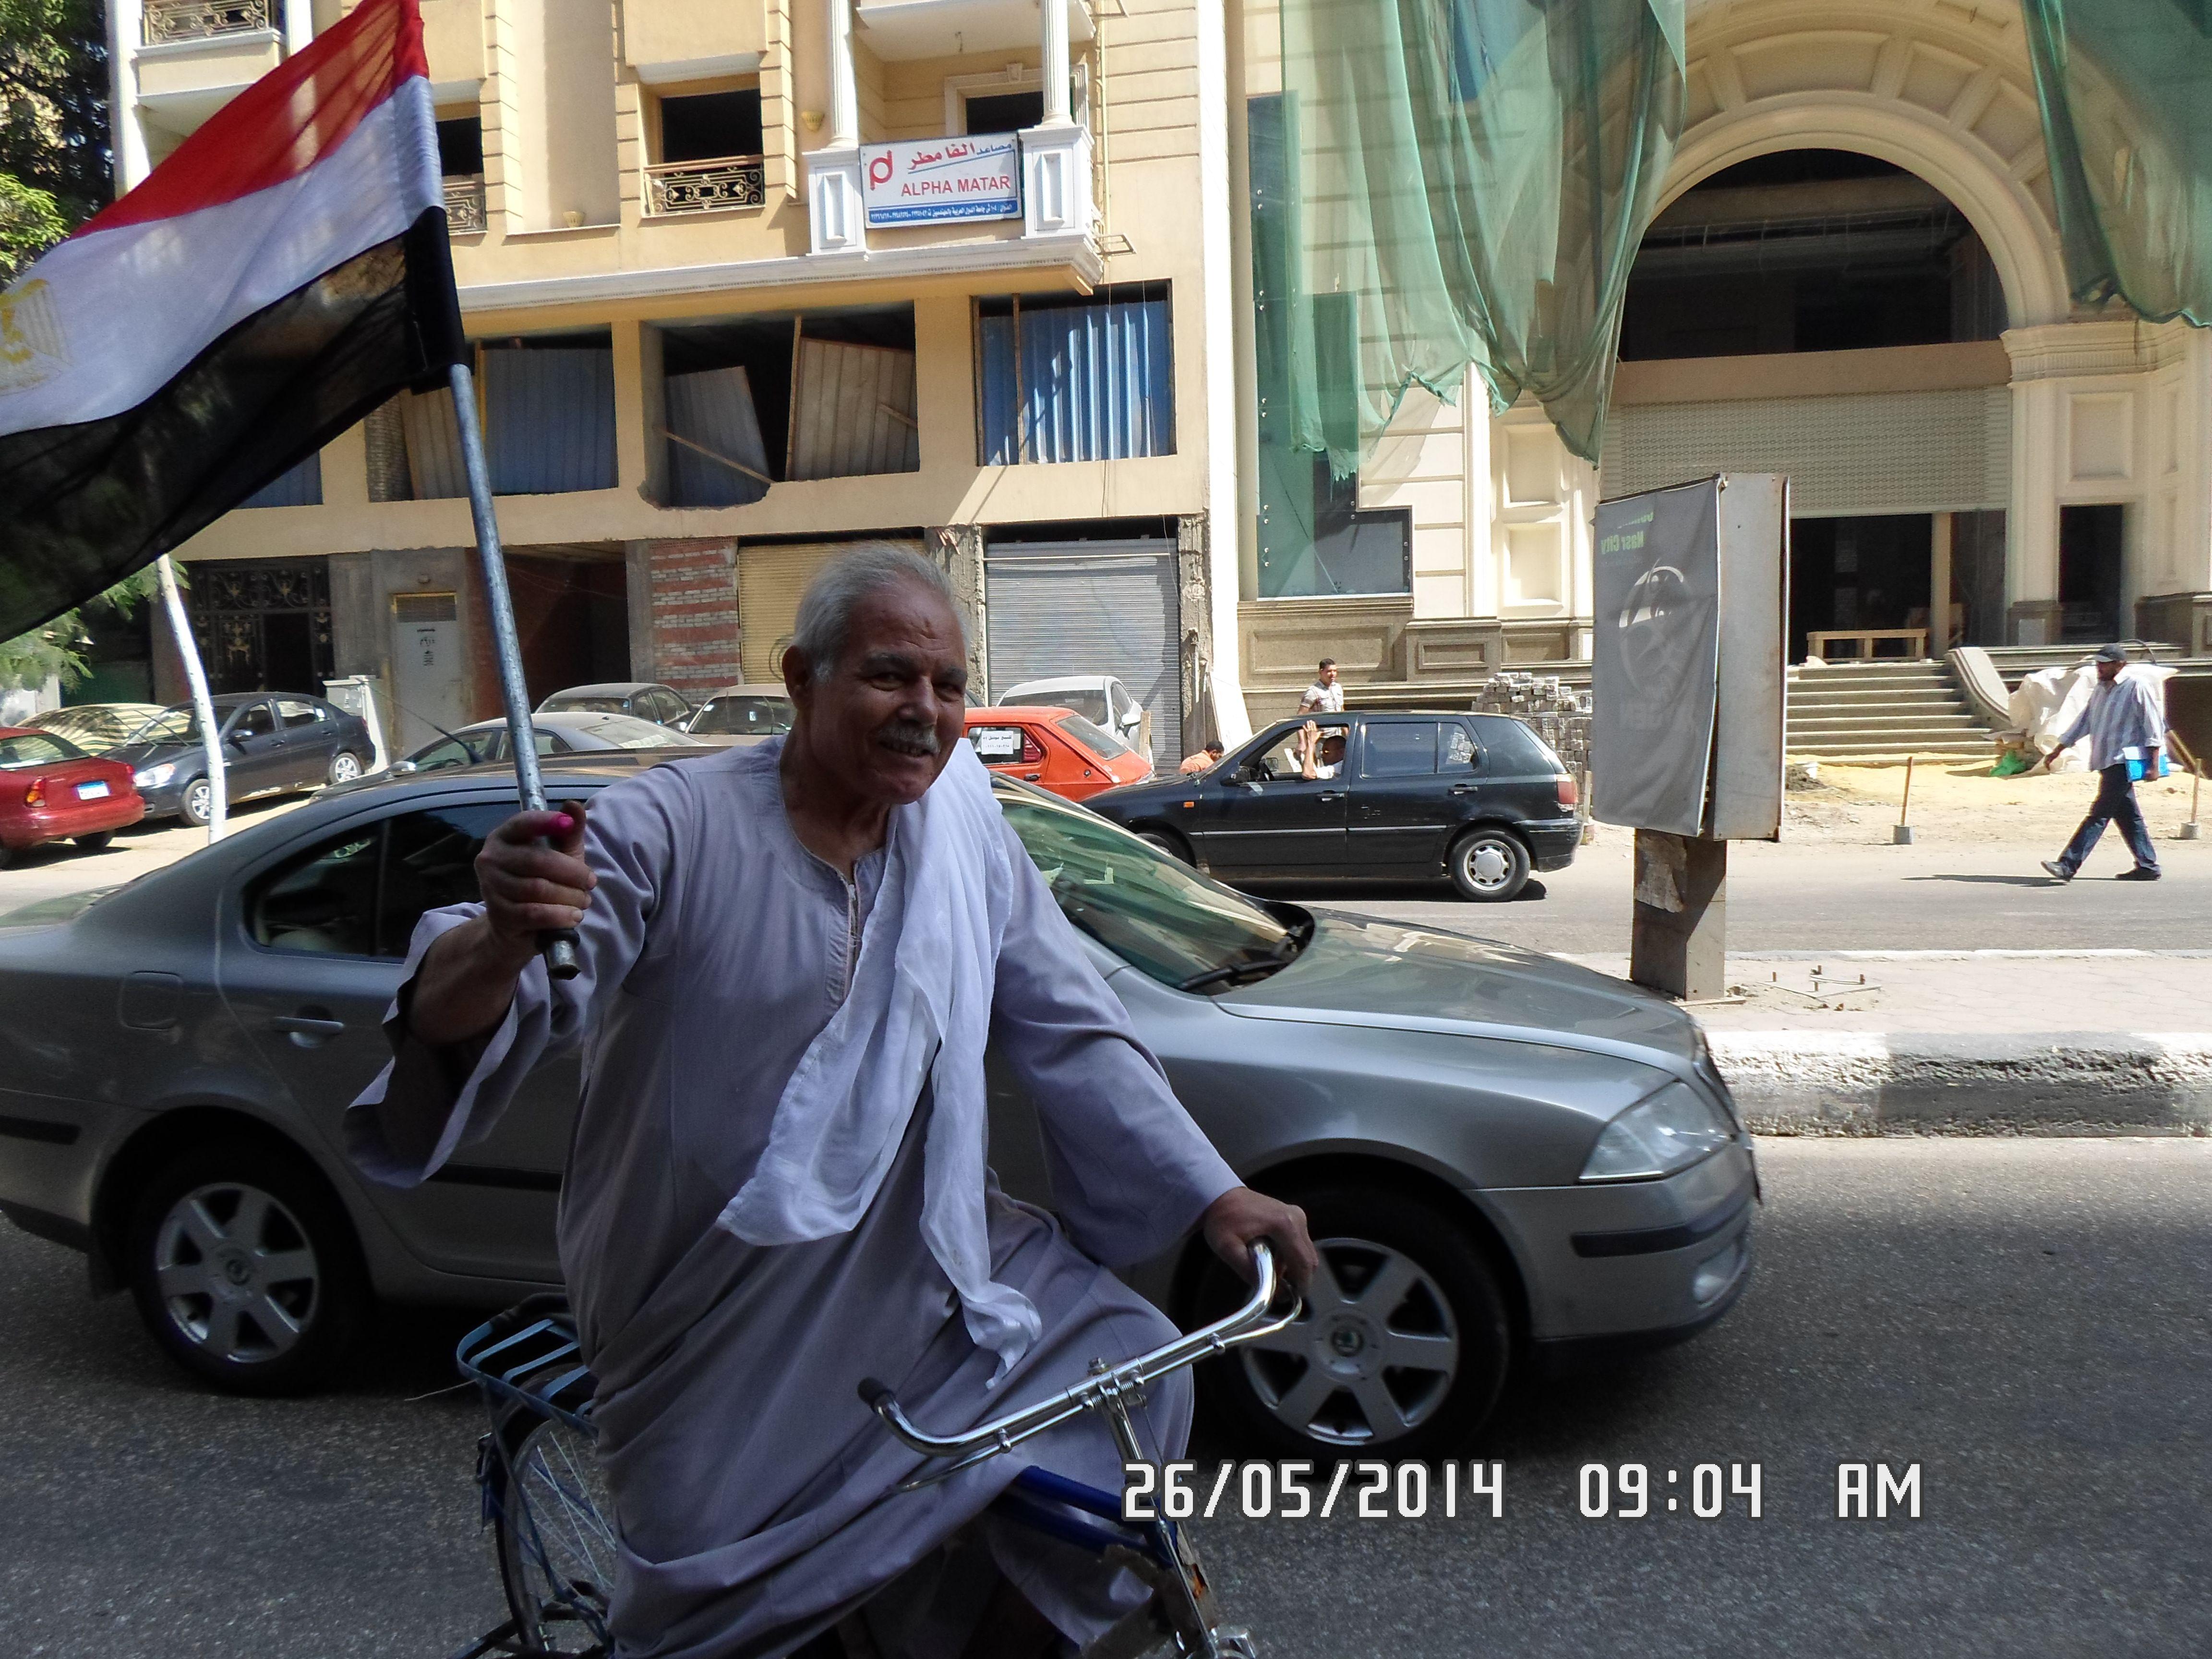 Egypt 2014 election